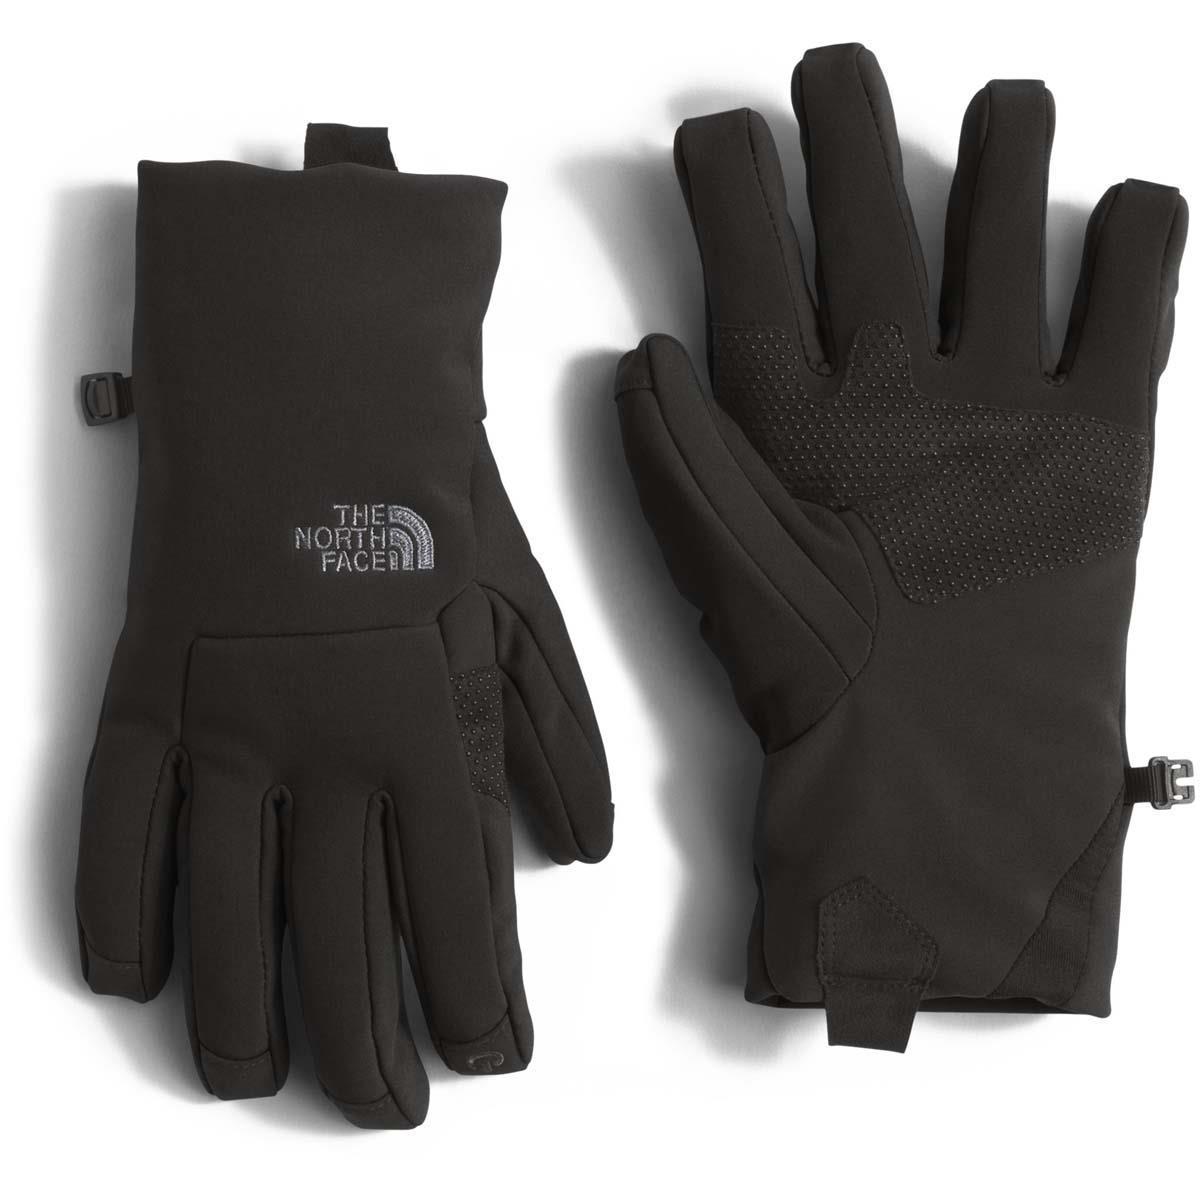 3b3969e07 The North Face Apex+Etip Glove - Women's